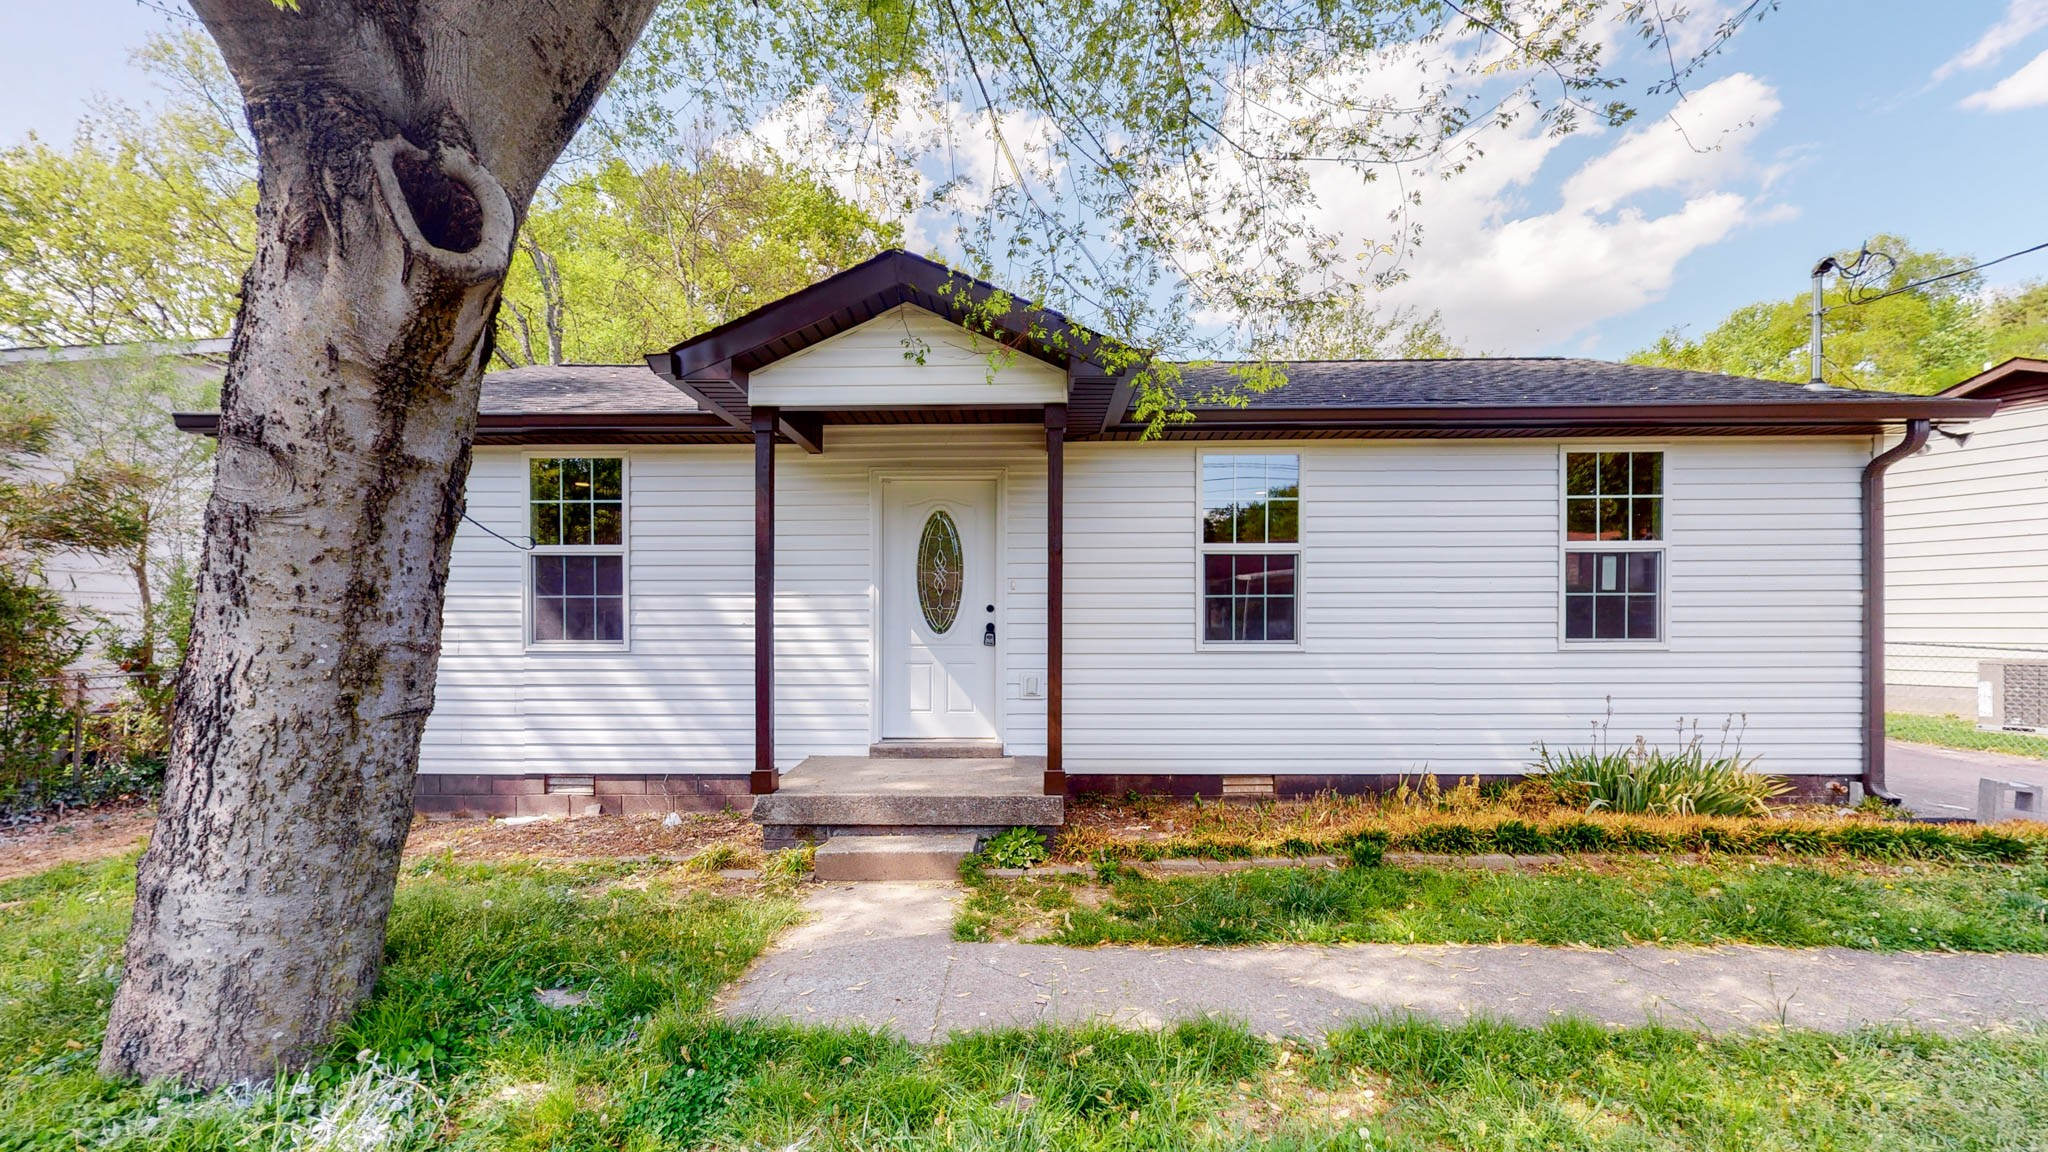 113 Lane Wood Ct Property Photo - Nashville, TN real estate listing